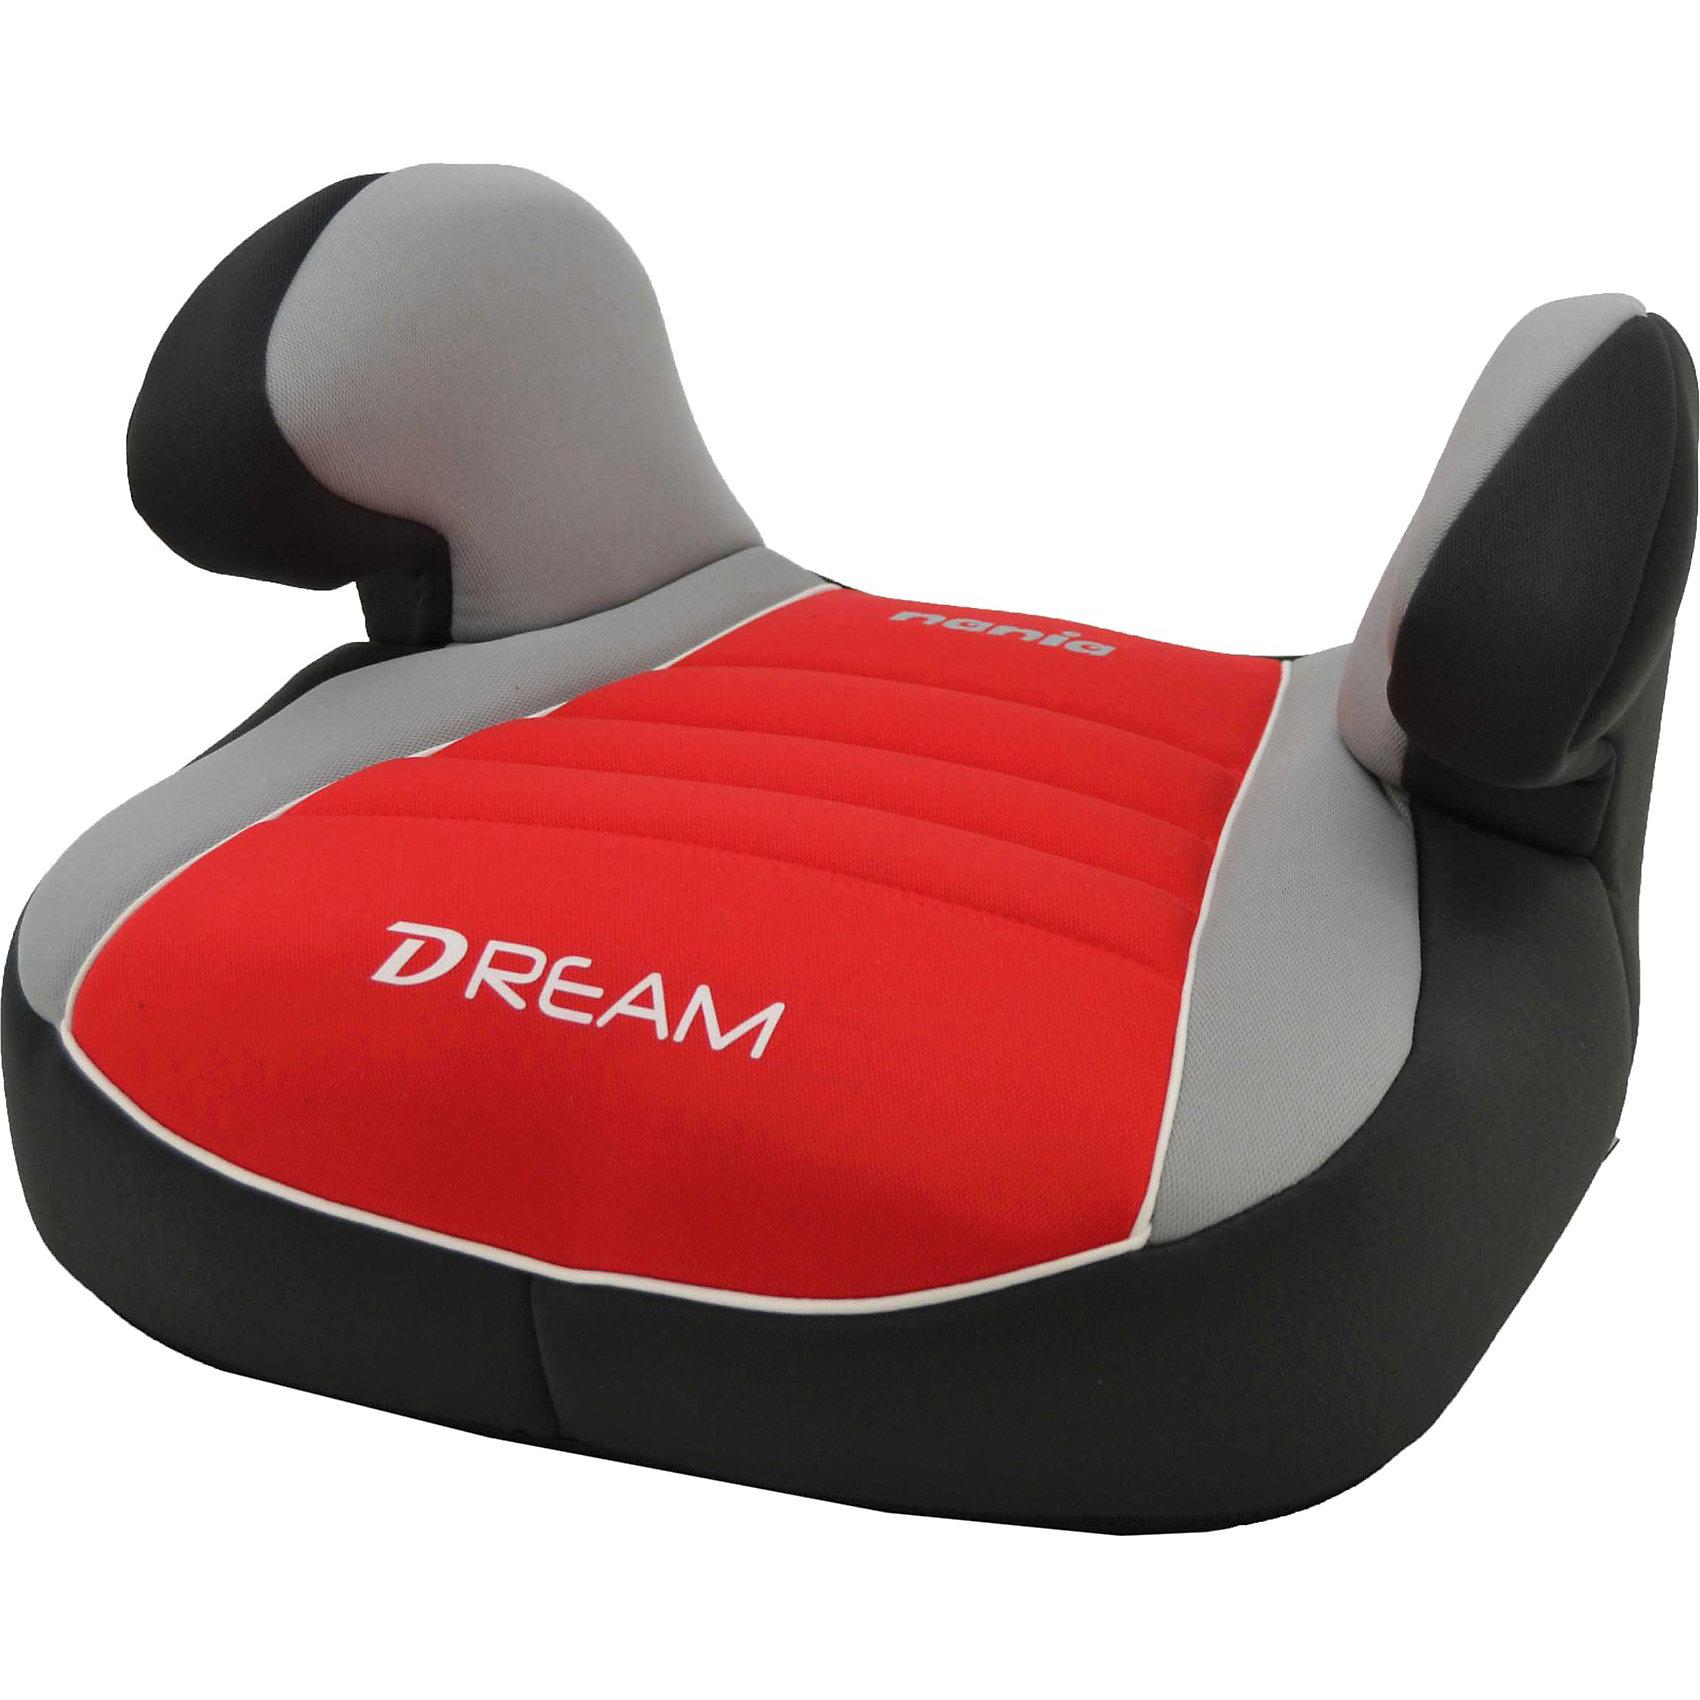 Автокресло Dream LX, 15-36 кг., Nania, agora carmin